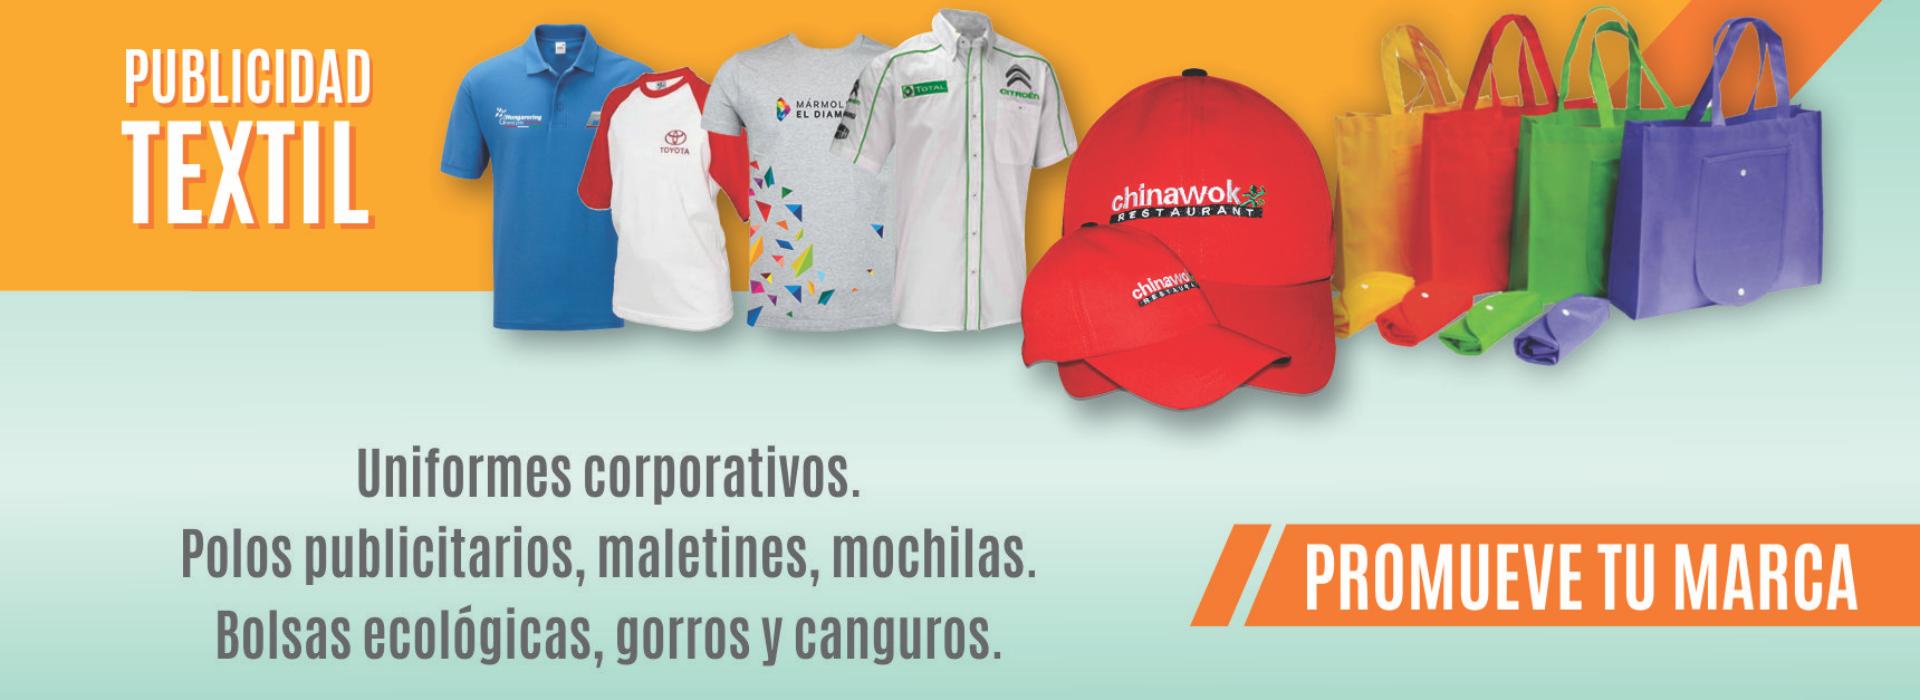 banner web publicidad textil